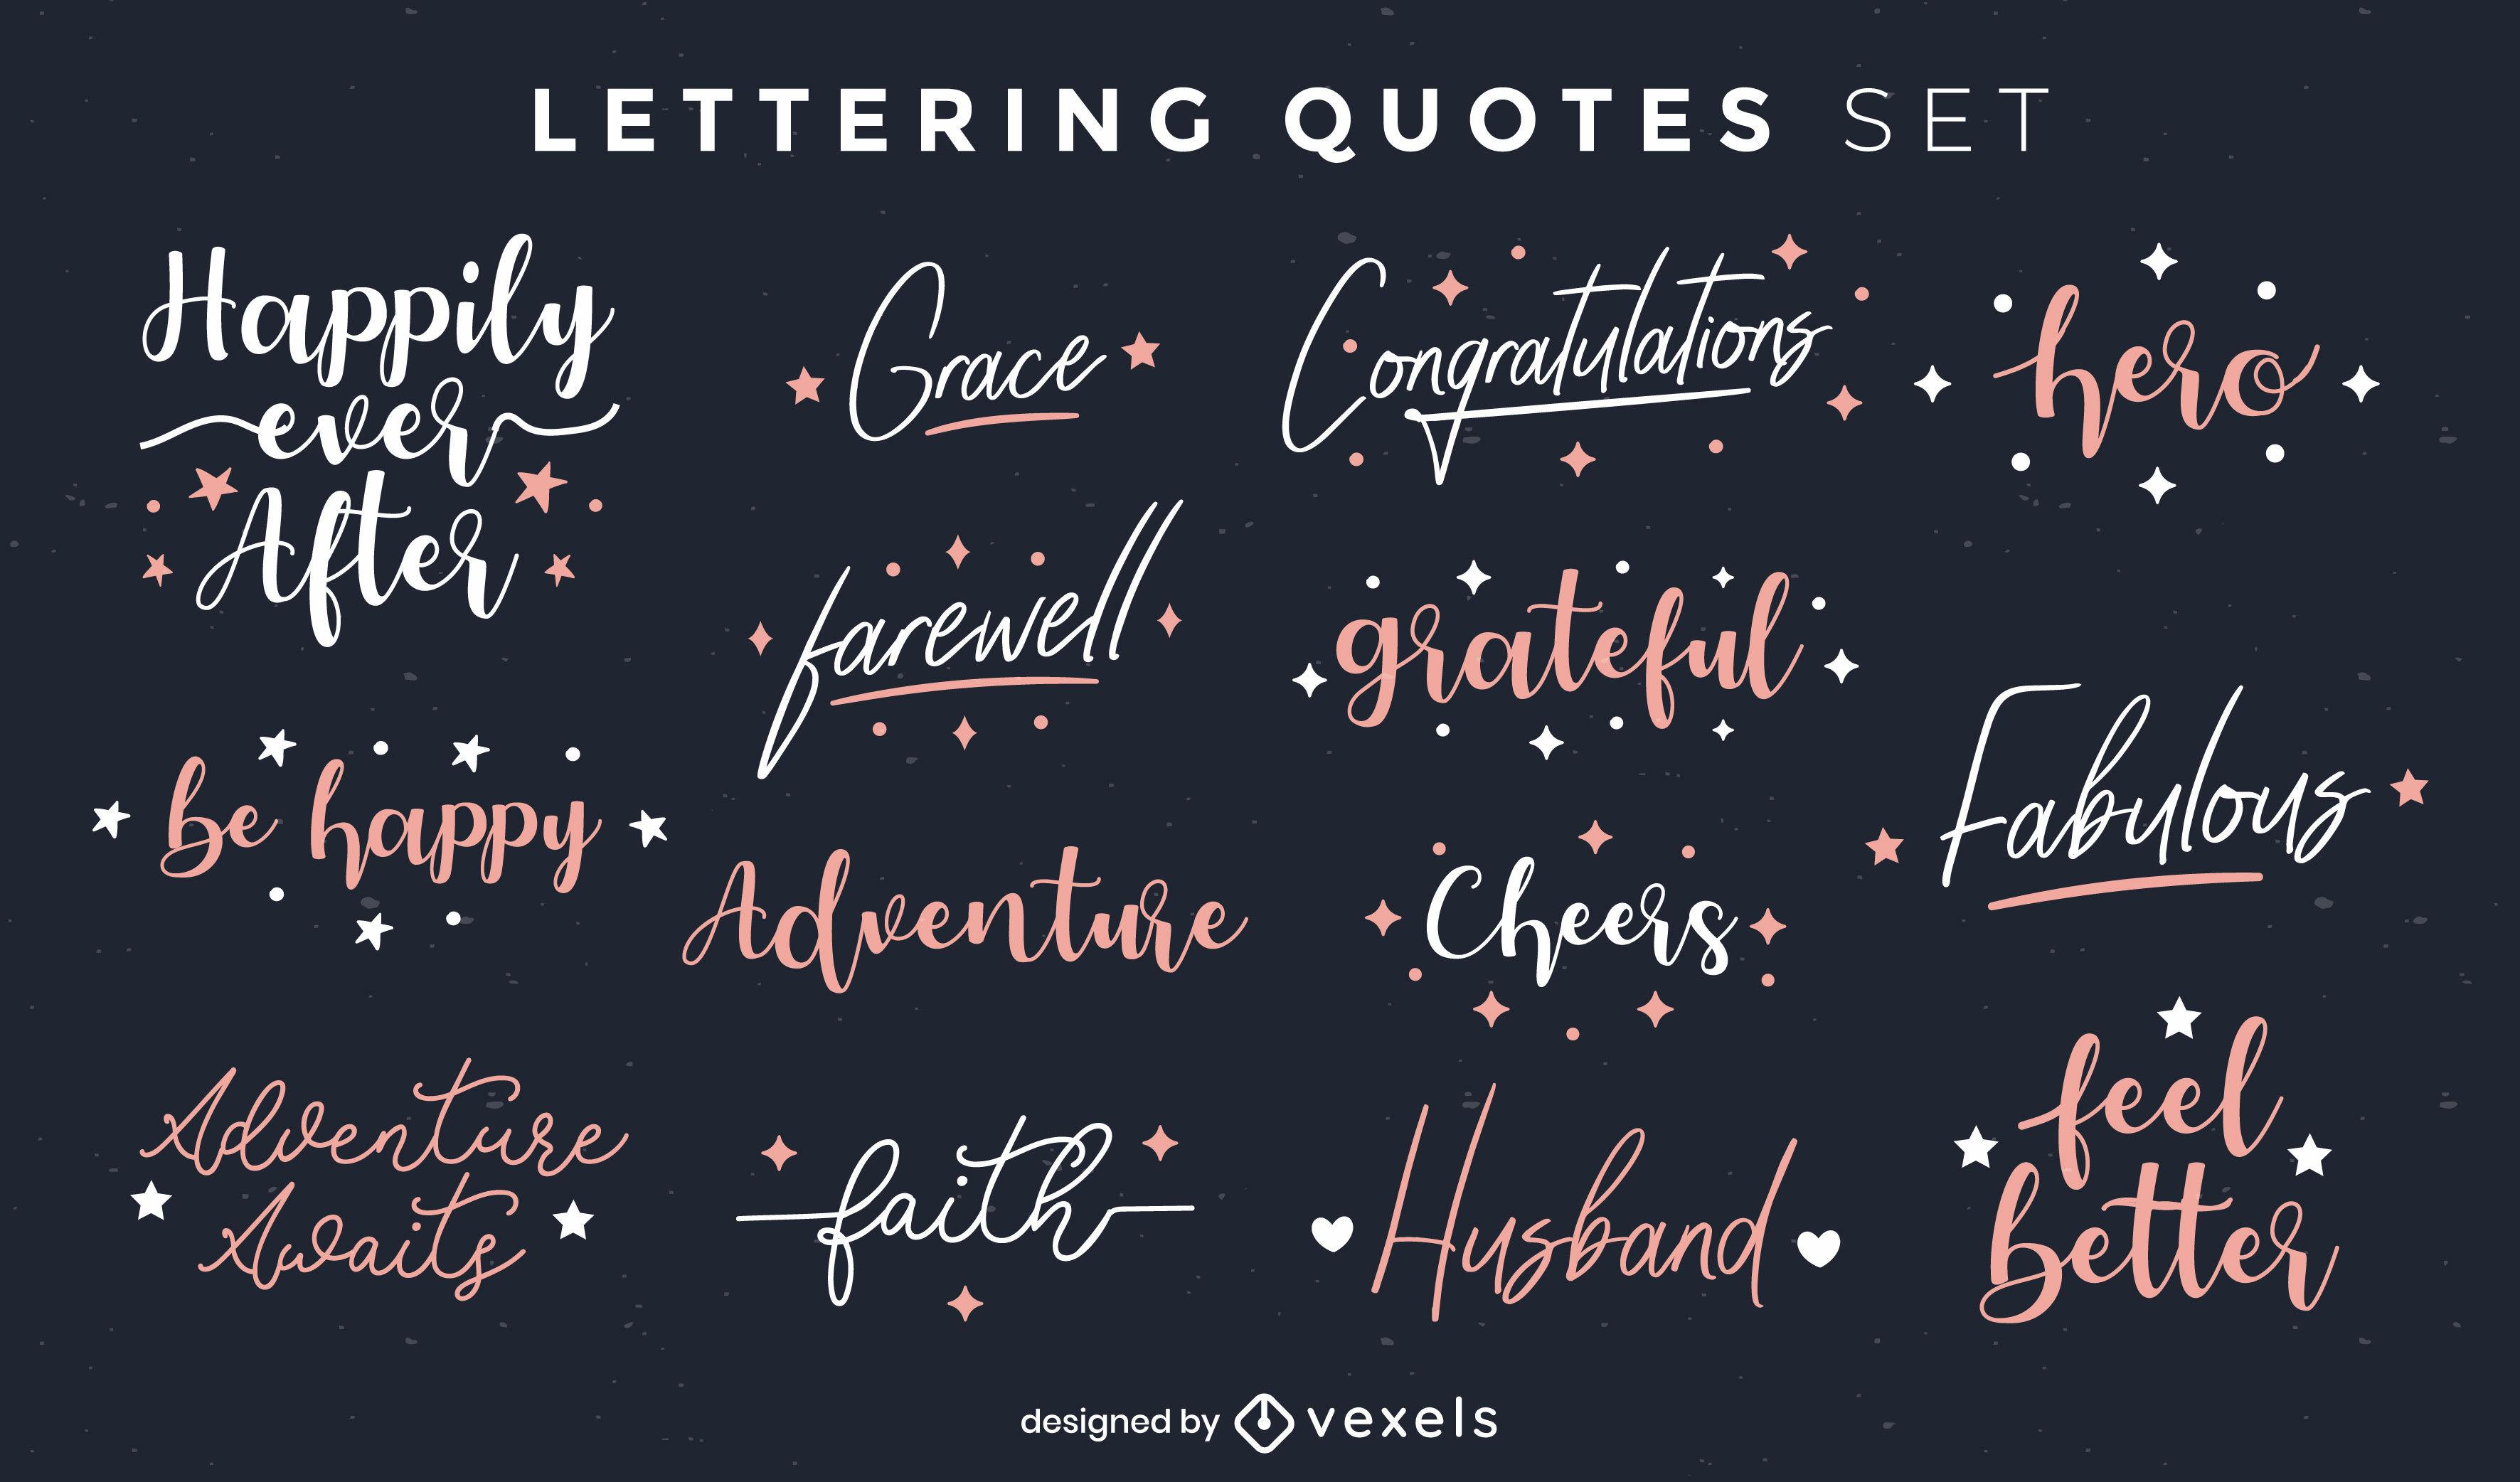 Lettering positive quotes set